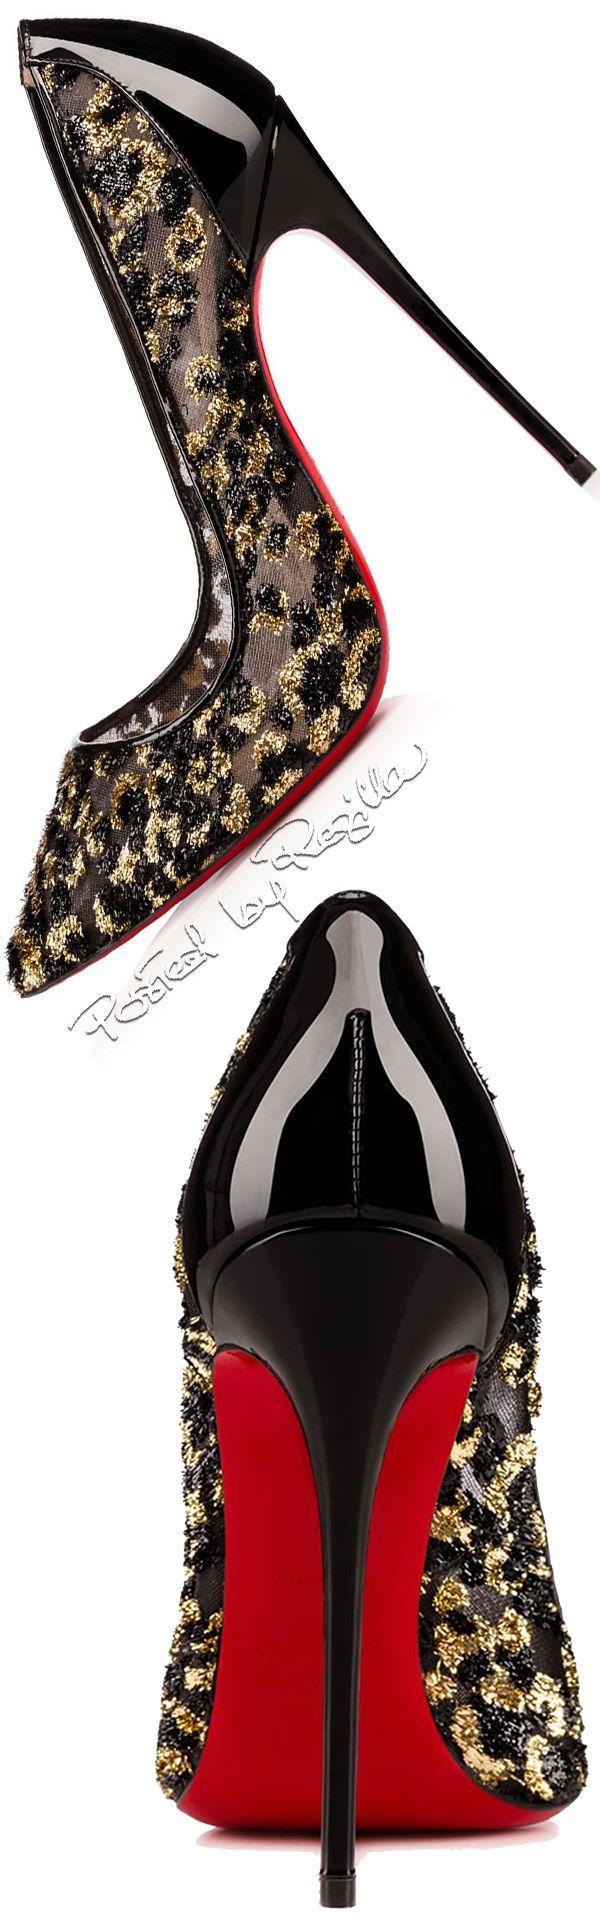 Tendance Chaussures Regilla Una Fiorentina in California Tendance & idée Chaussures Femme 2016/2017 Description Regilla Christian Louboutin